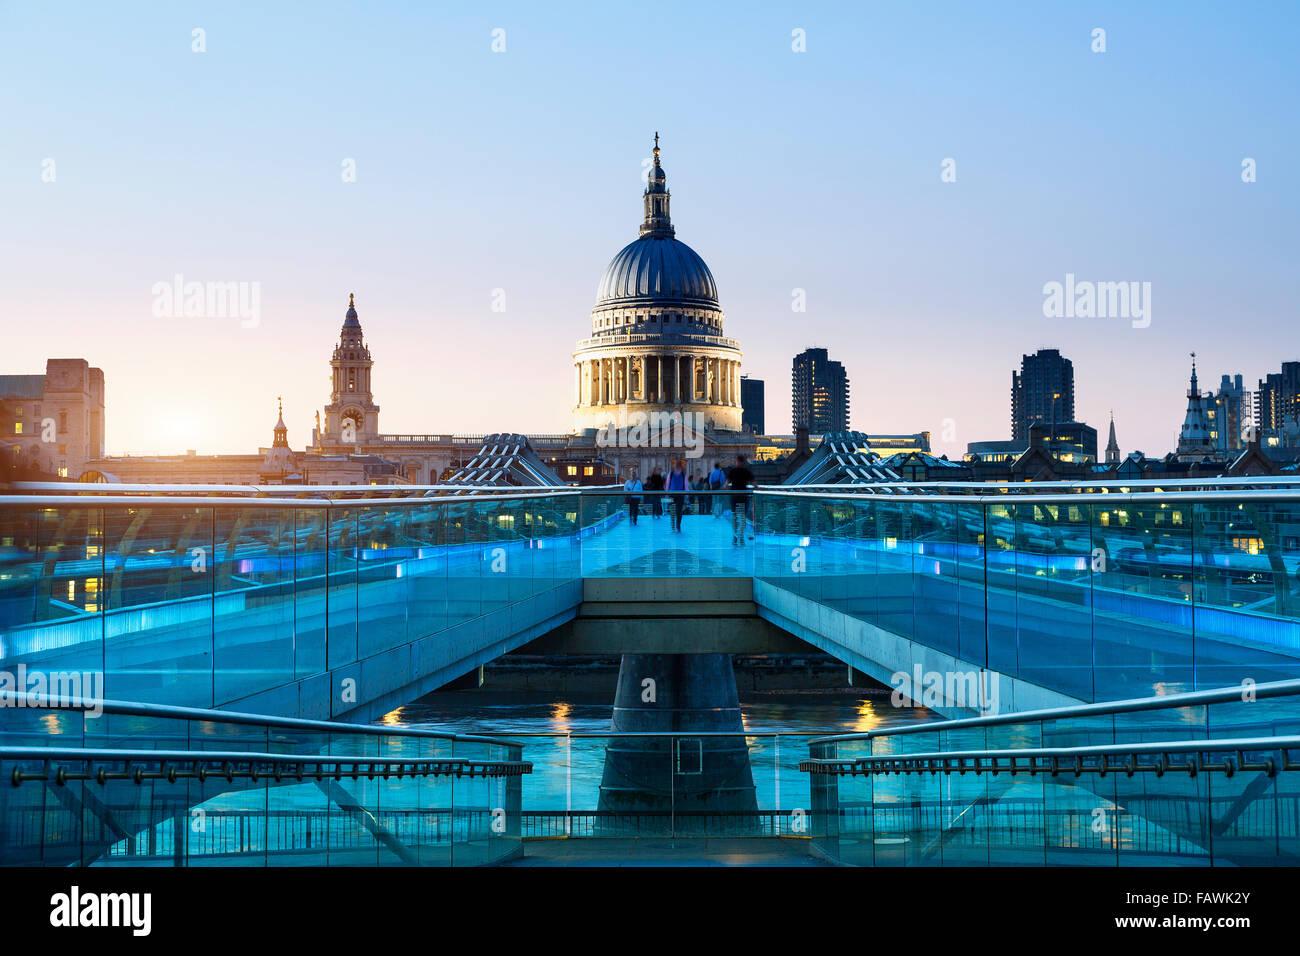 London, Millennium bridge illuminated - Stock Image